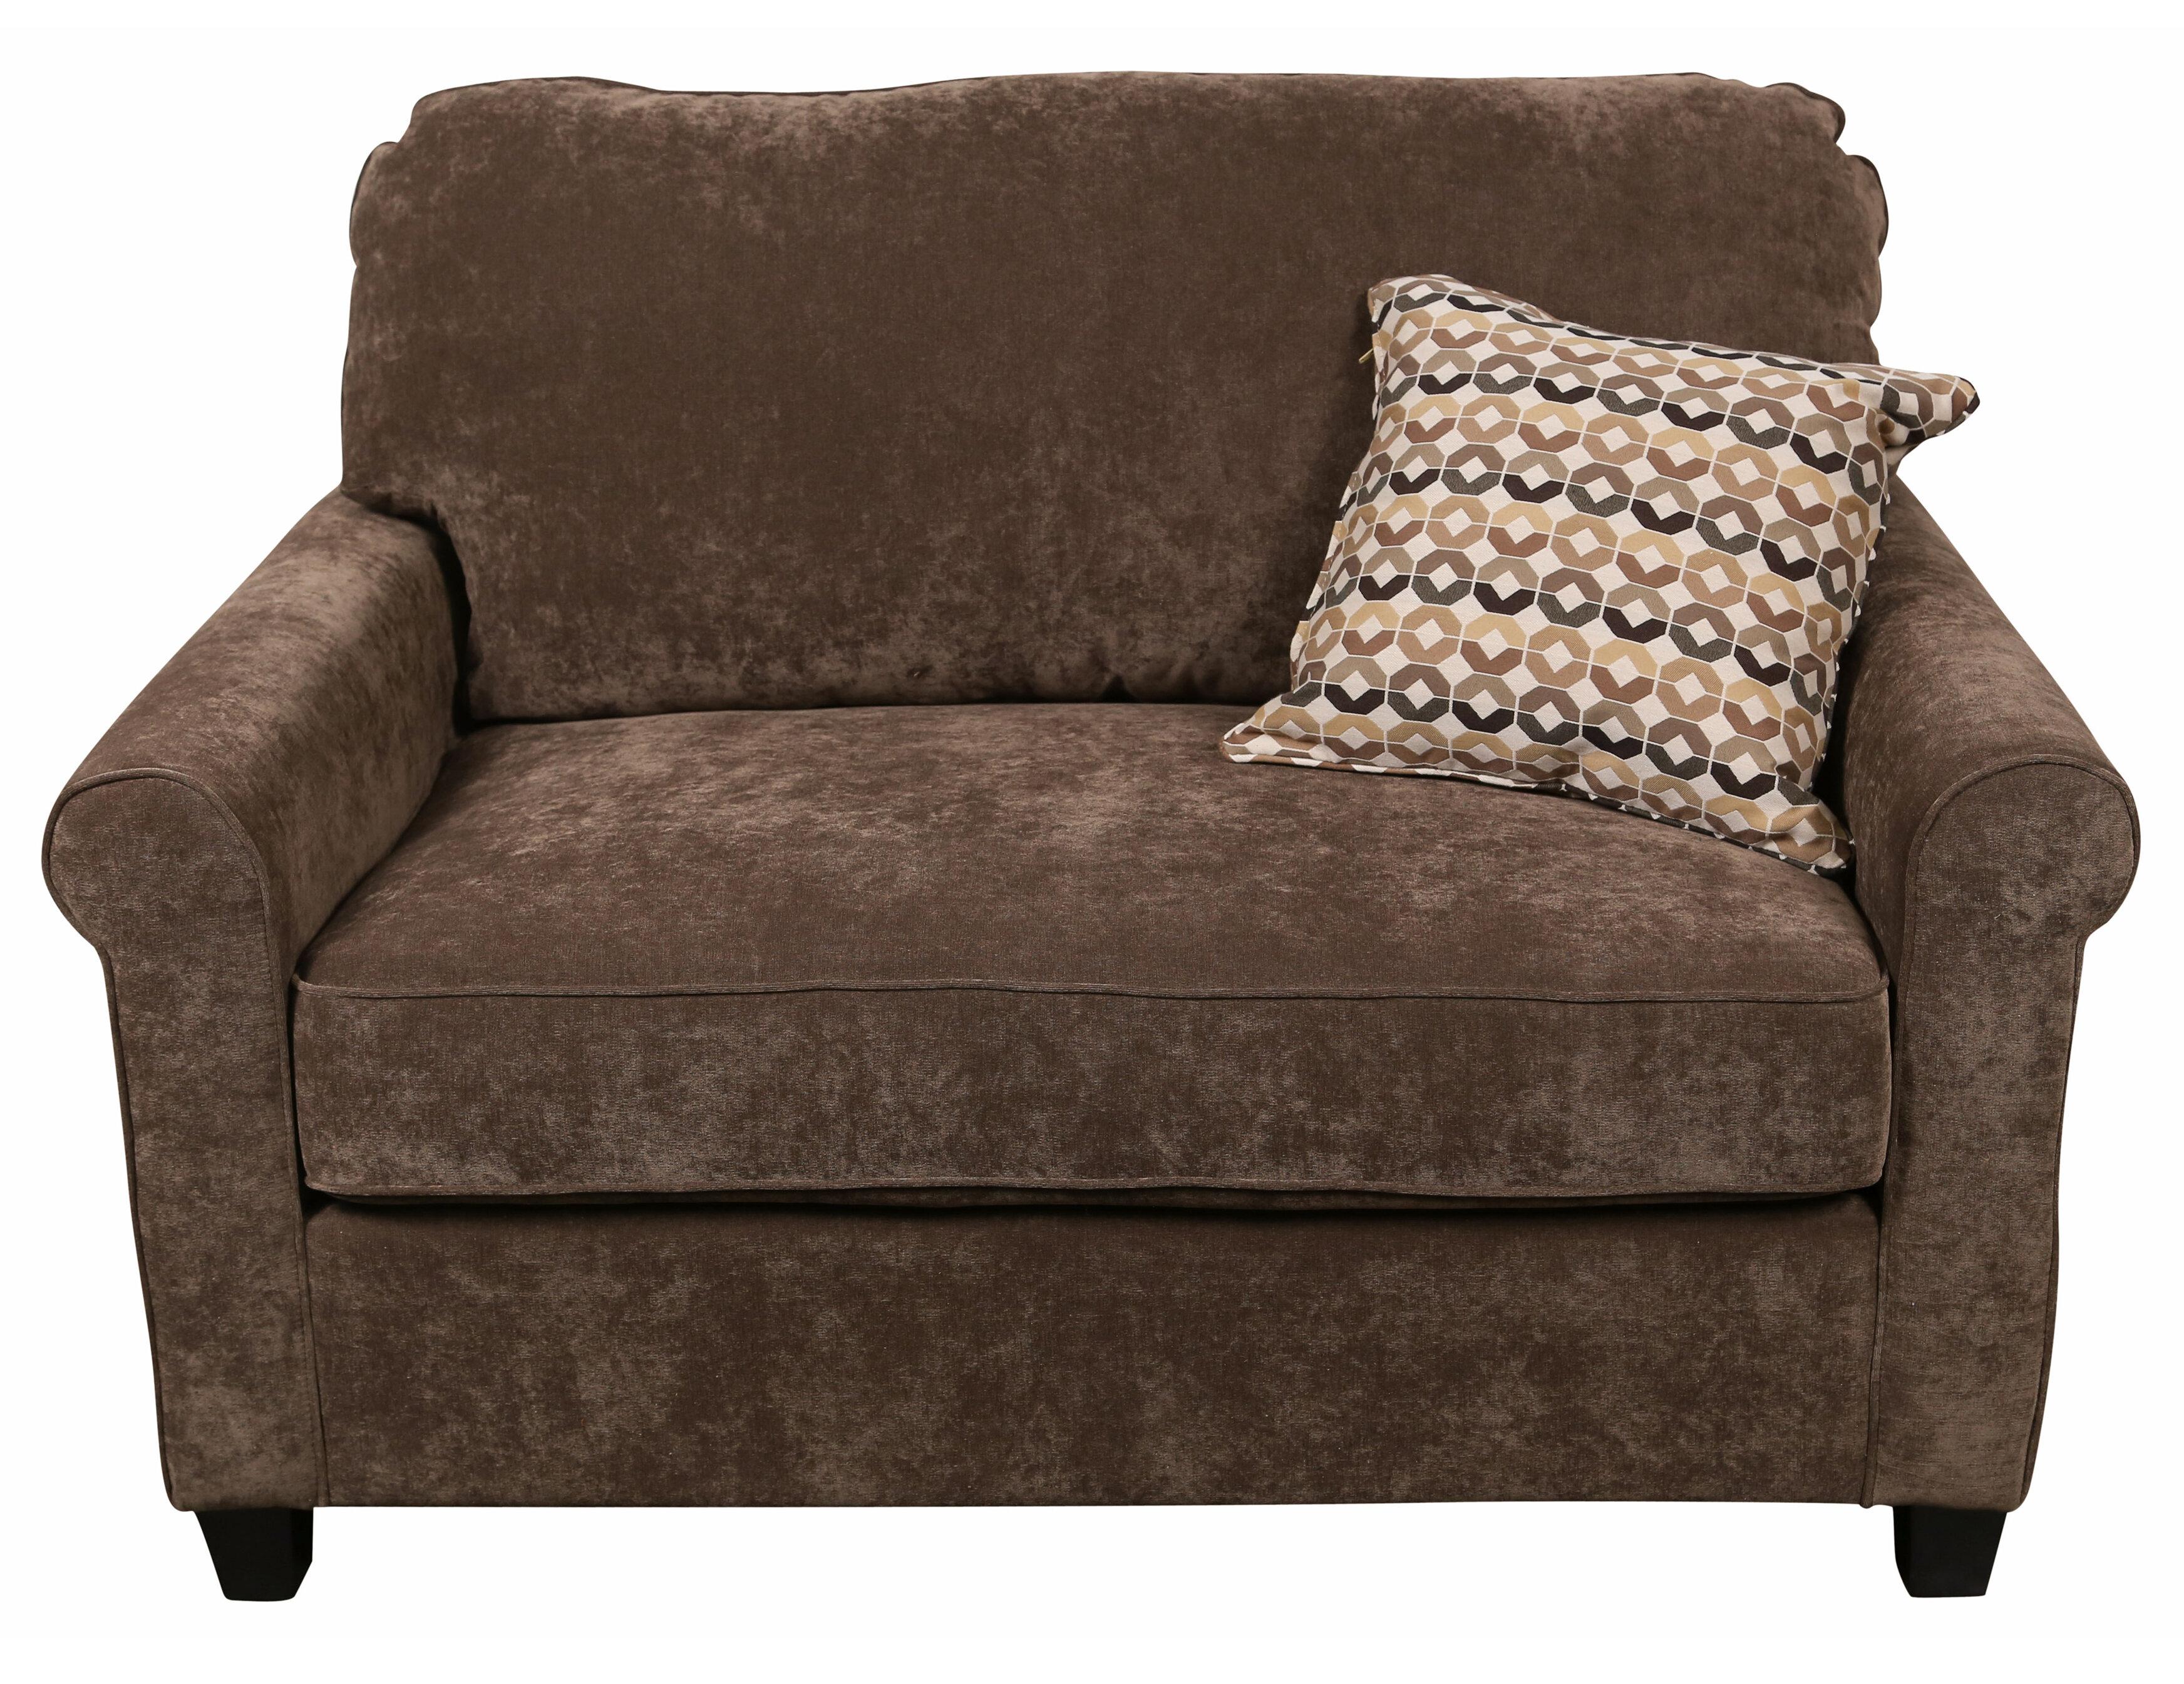 Serafin Sleeper Sofa Bed Loveseat